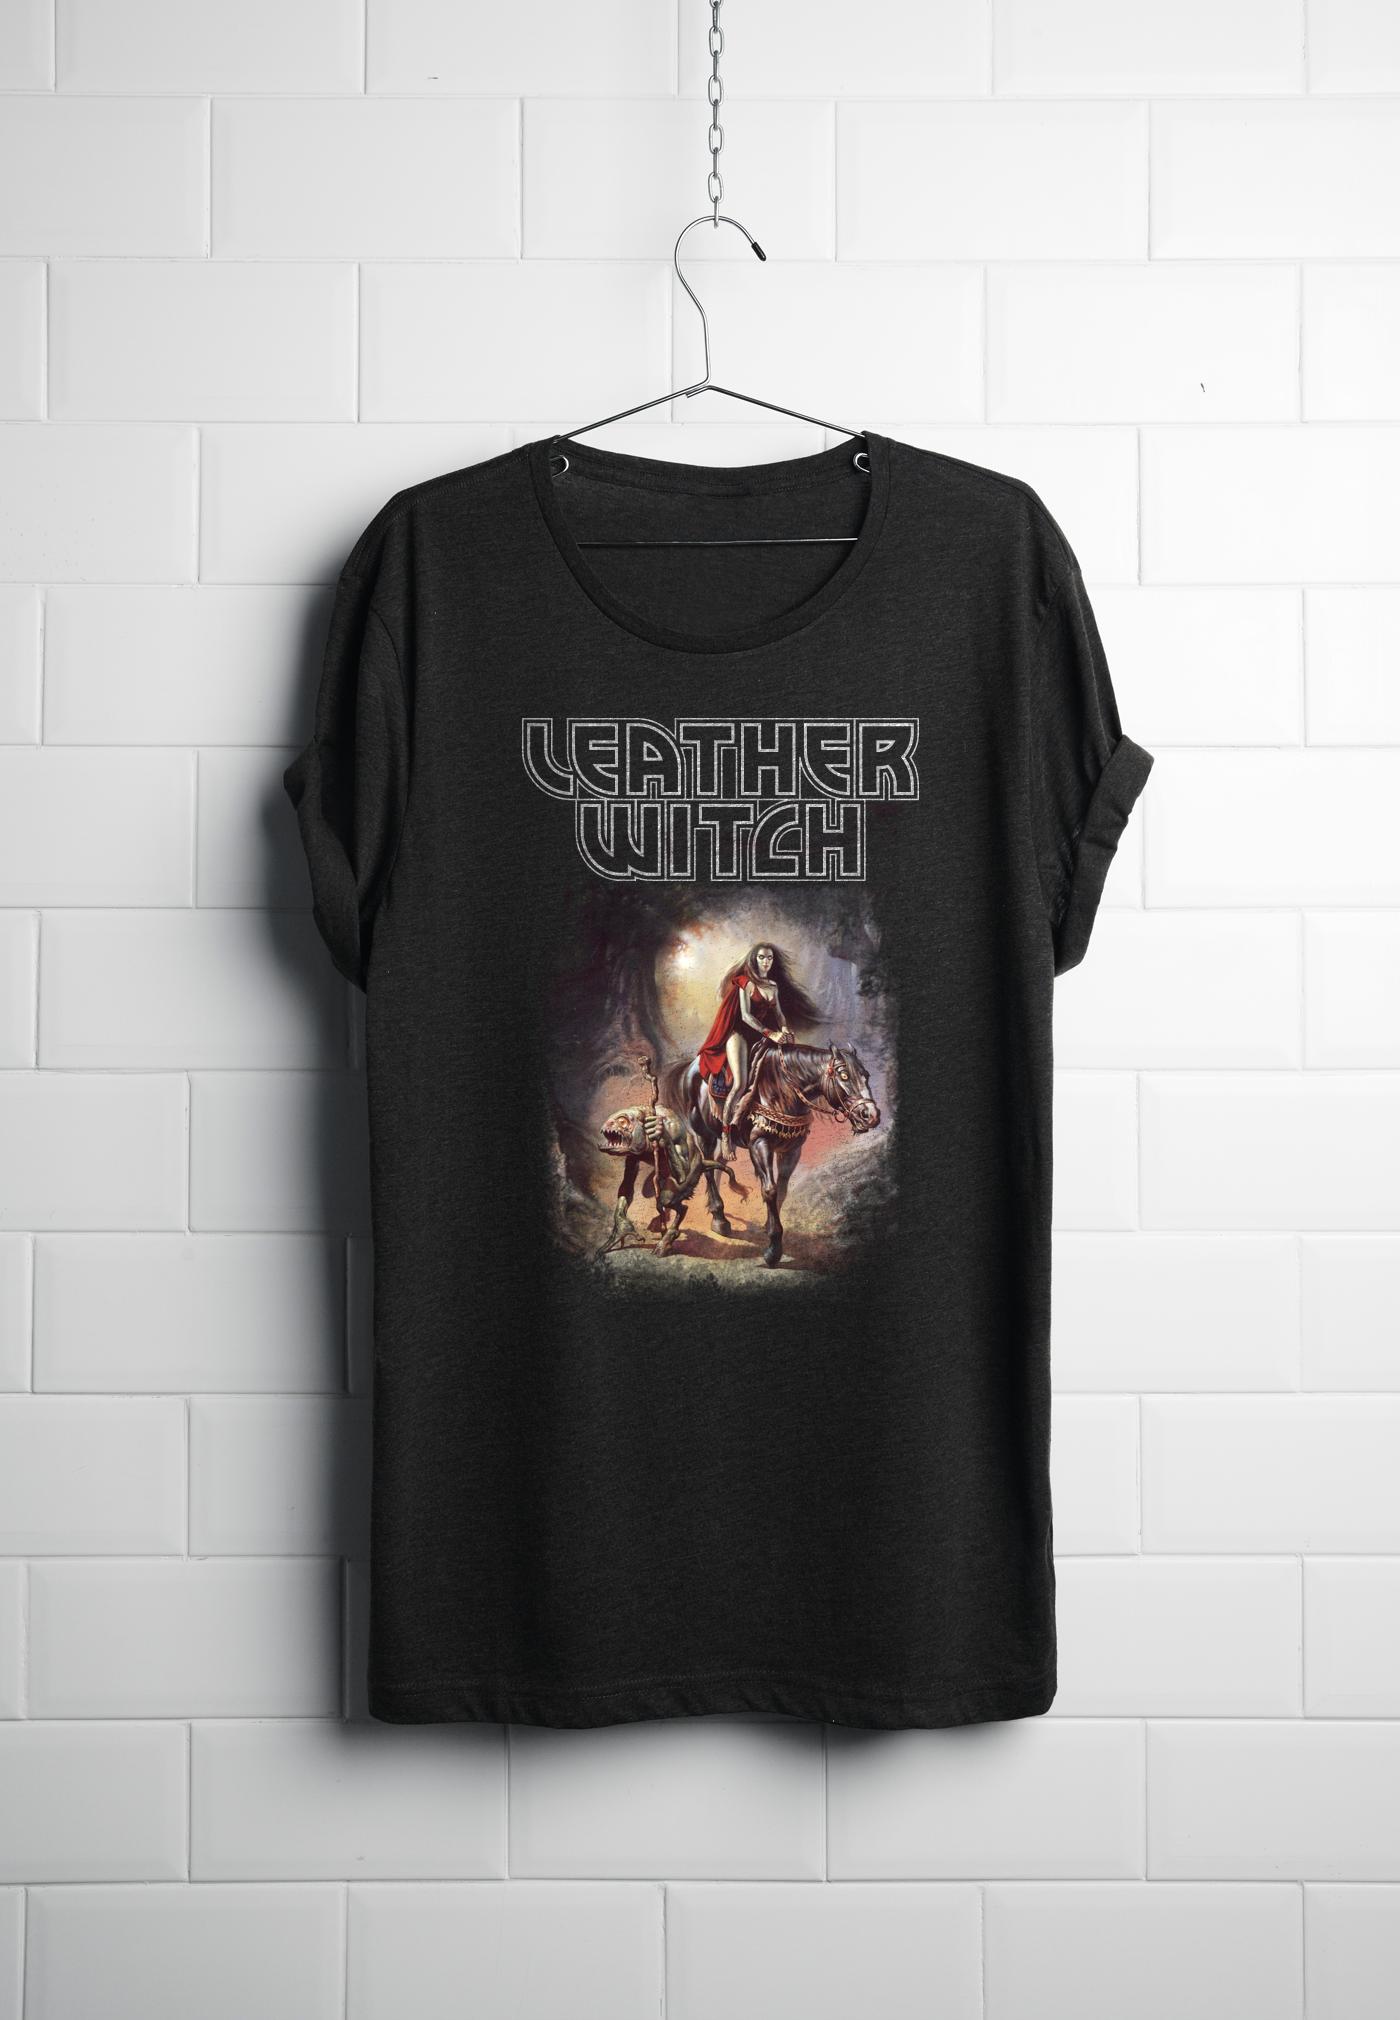 metal heavy metal black metal Thrash Metal nwobhm Free font metal font power metal font fonts